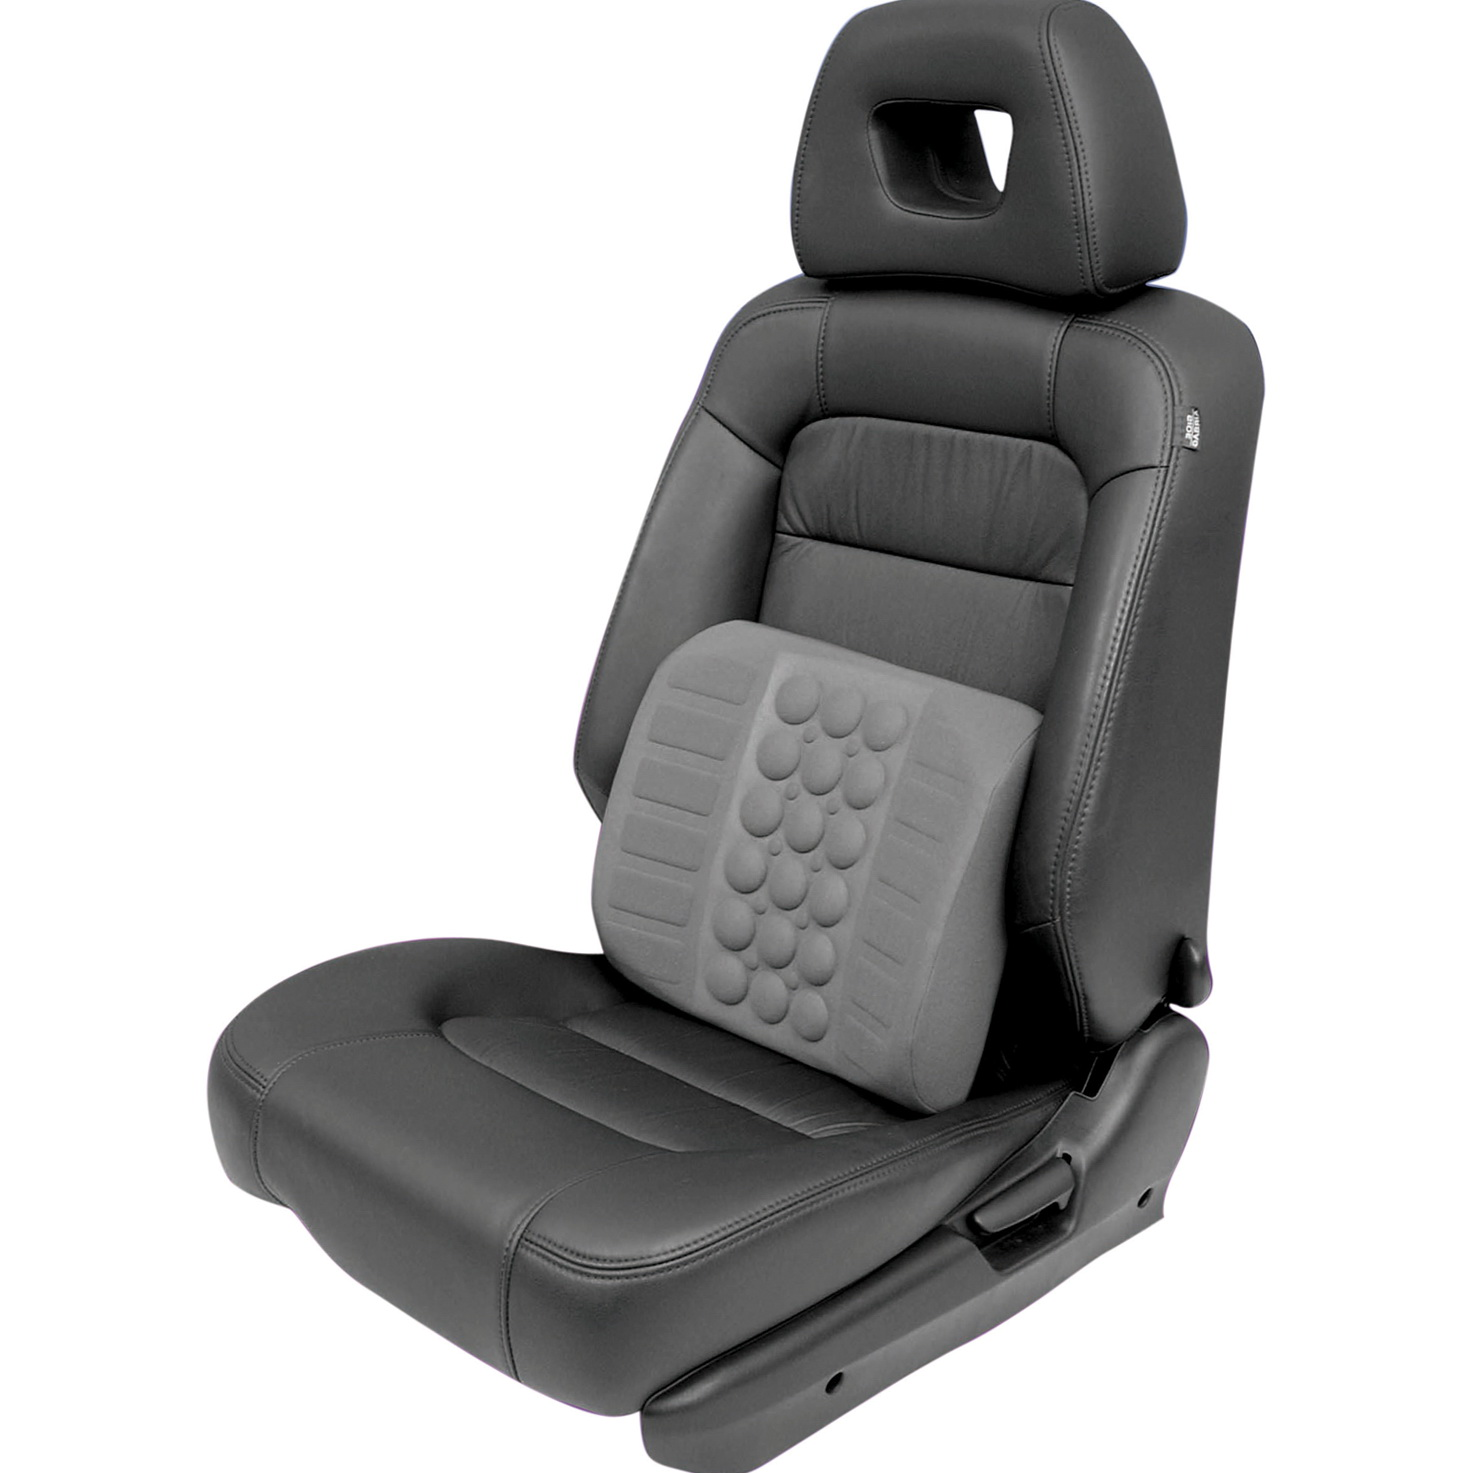 Lumbar Seat Cushion For Car